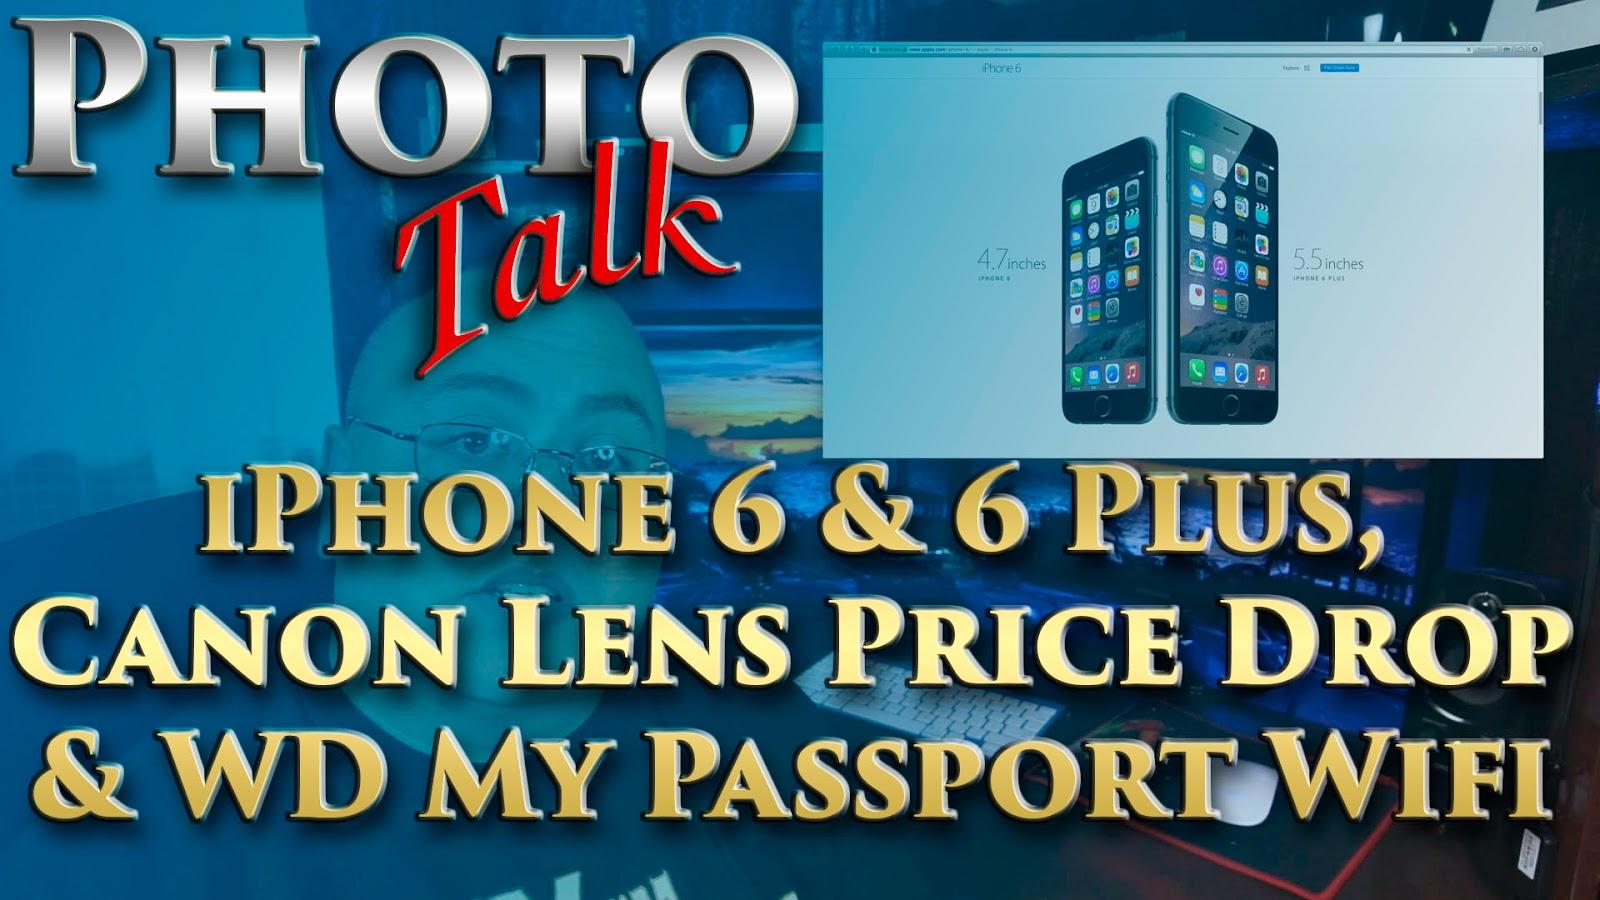 iPhone 6 & 6 Plus, Canon Lens Price Drop & WD My Passport Wifi